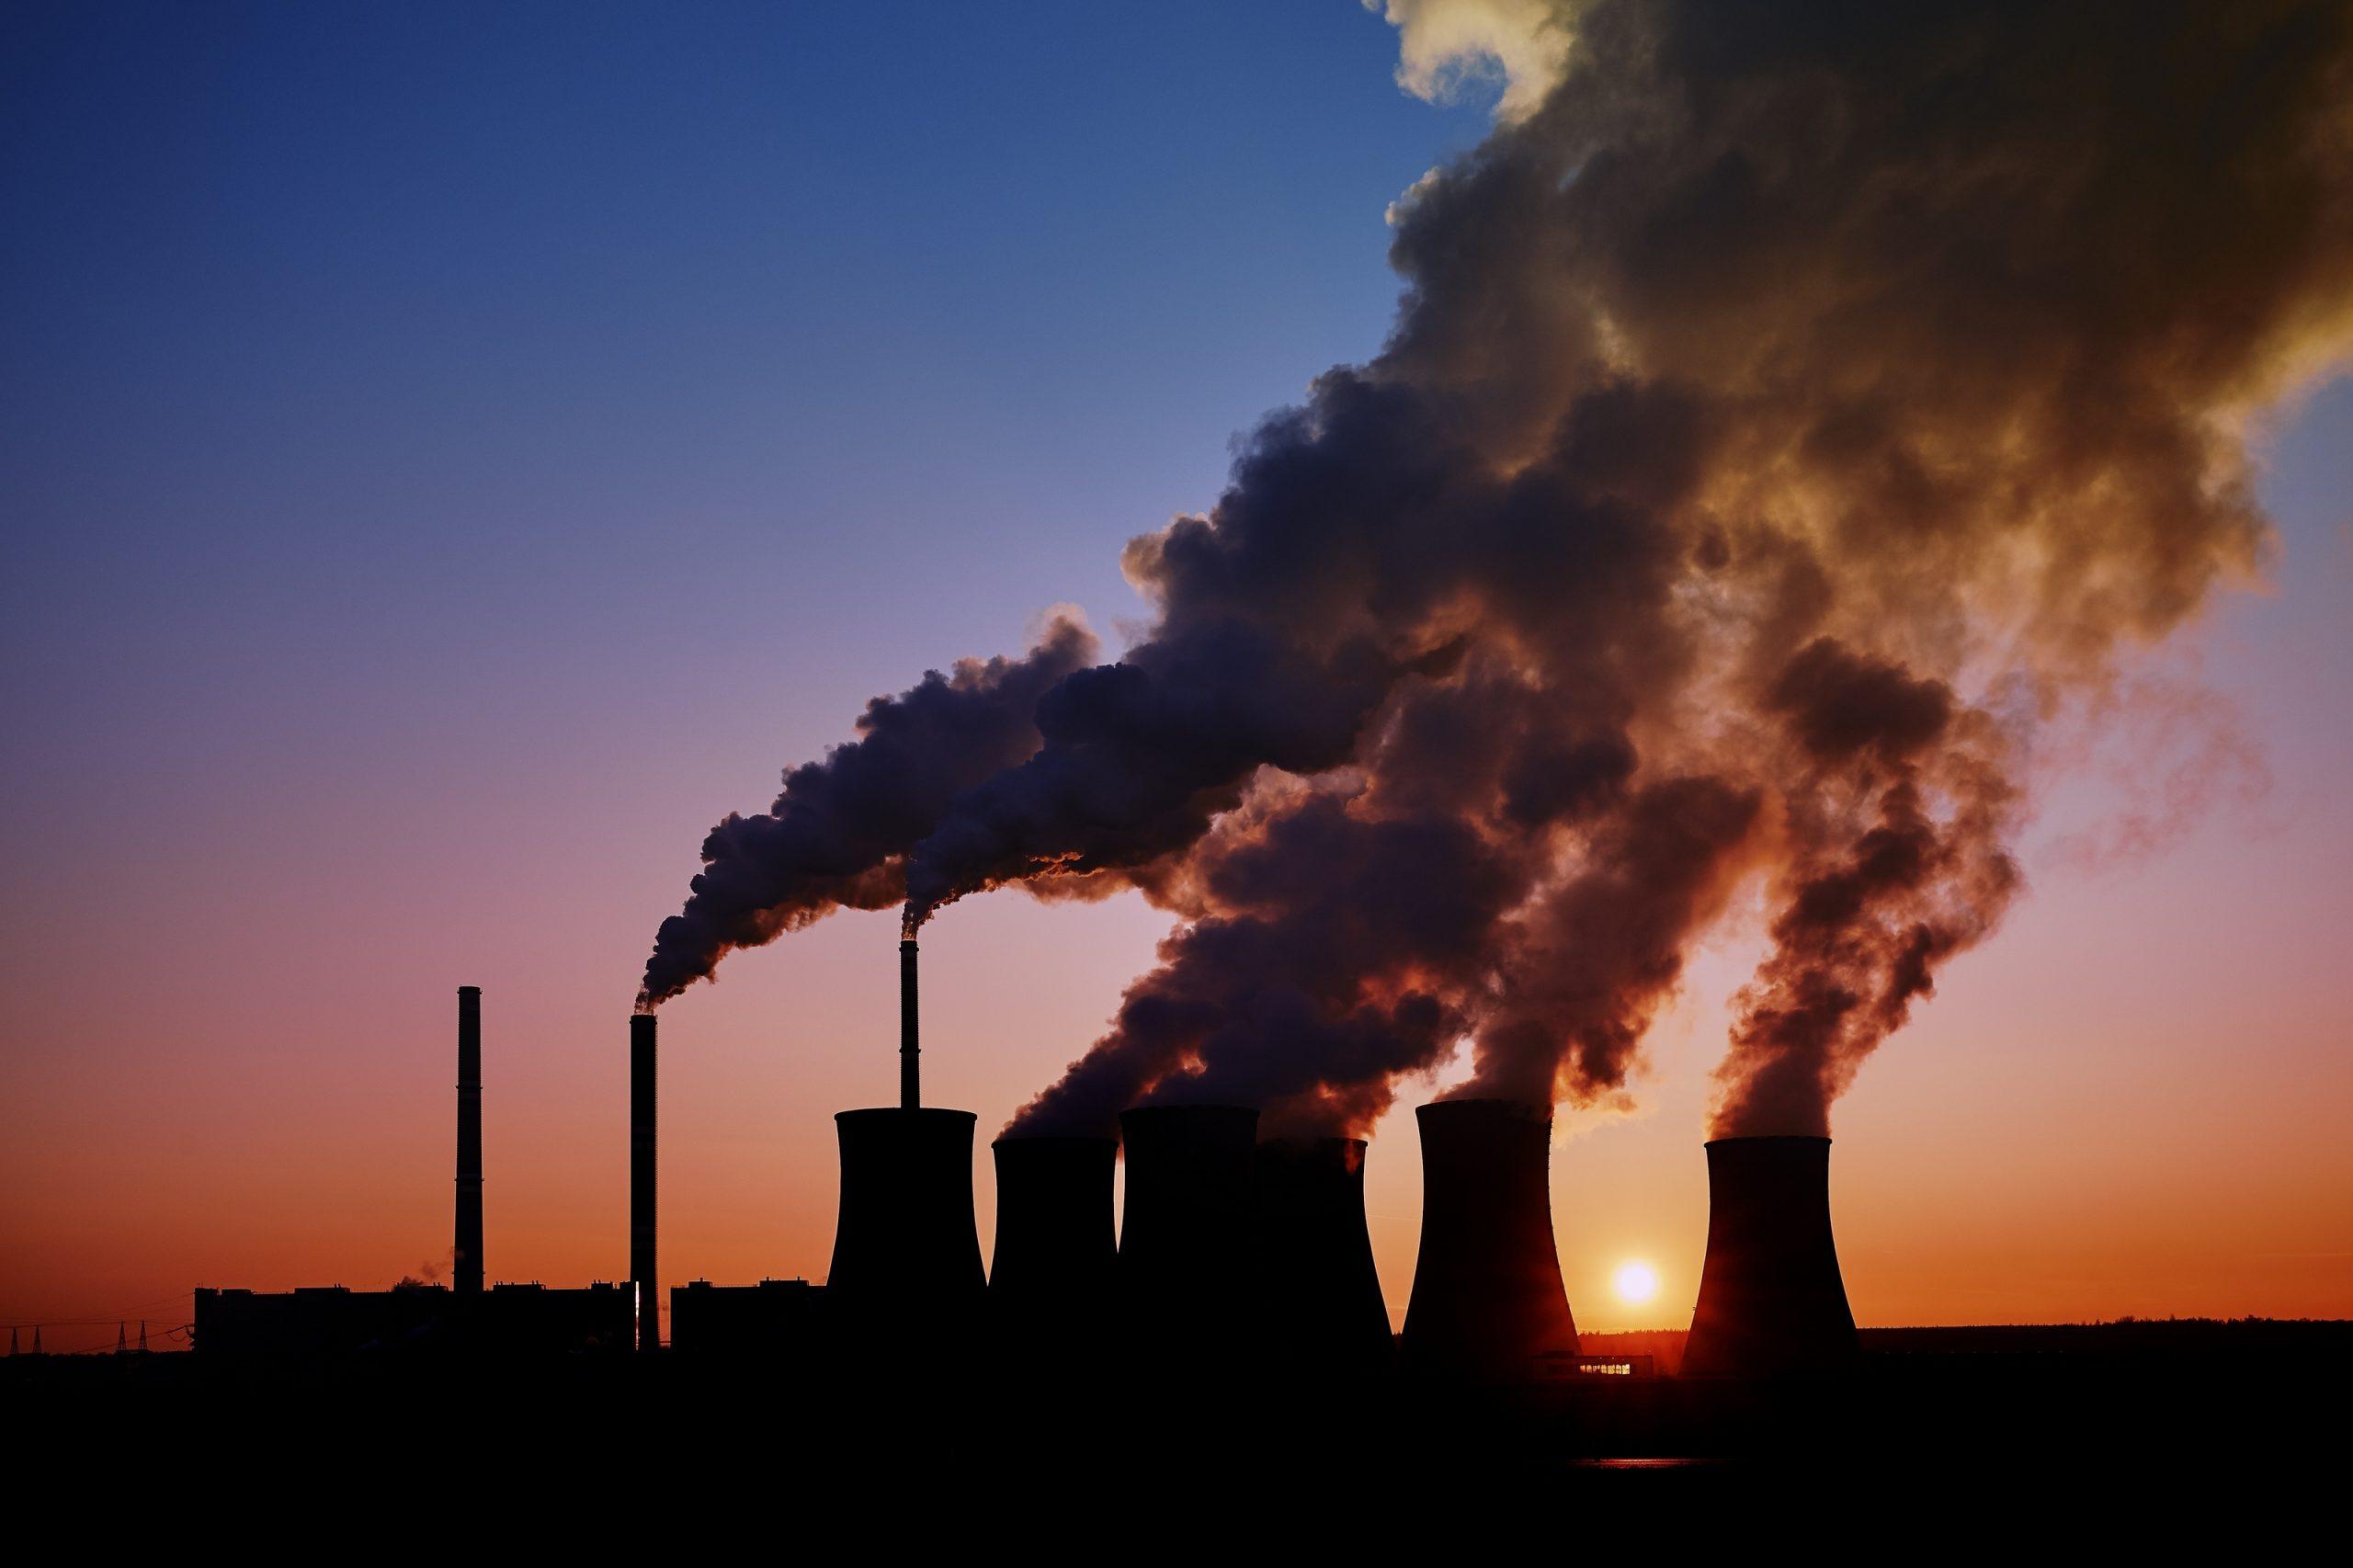 Disclosing GHG emissions